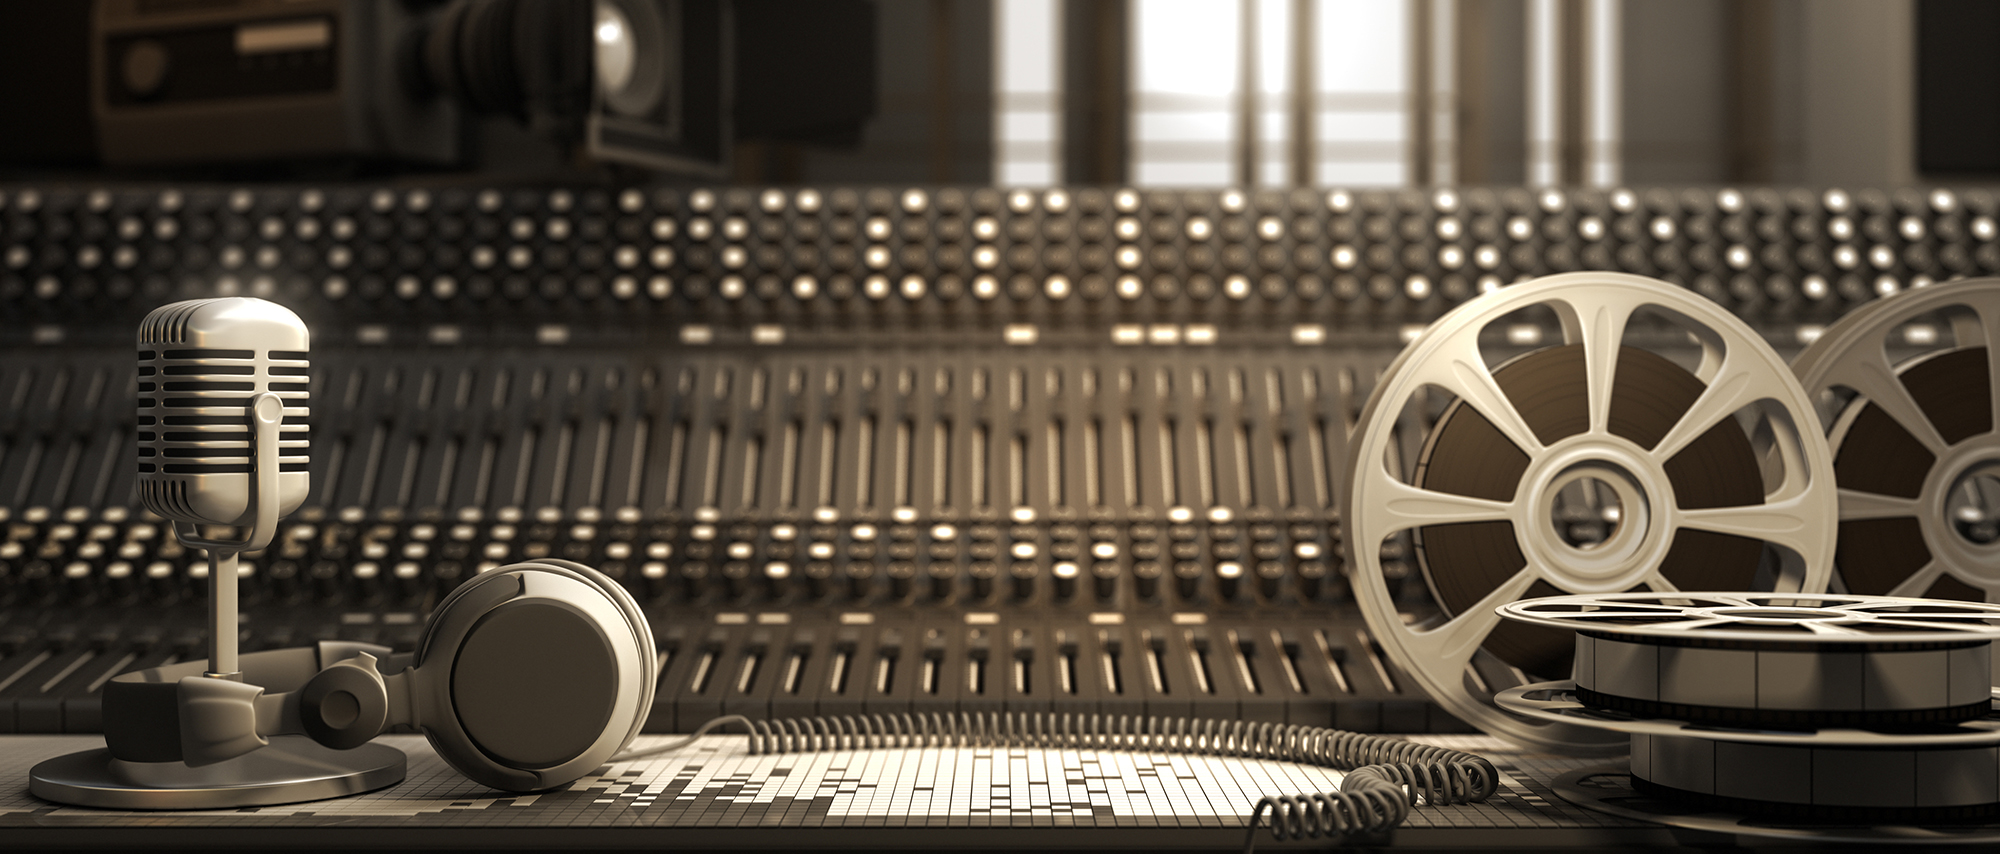 Studio background recording studio microphone - Music recording studio wallpaper ...